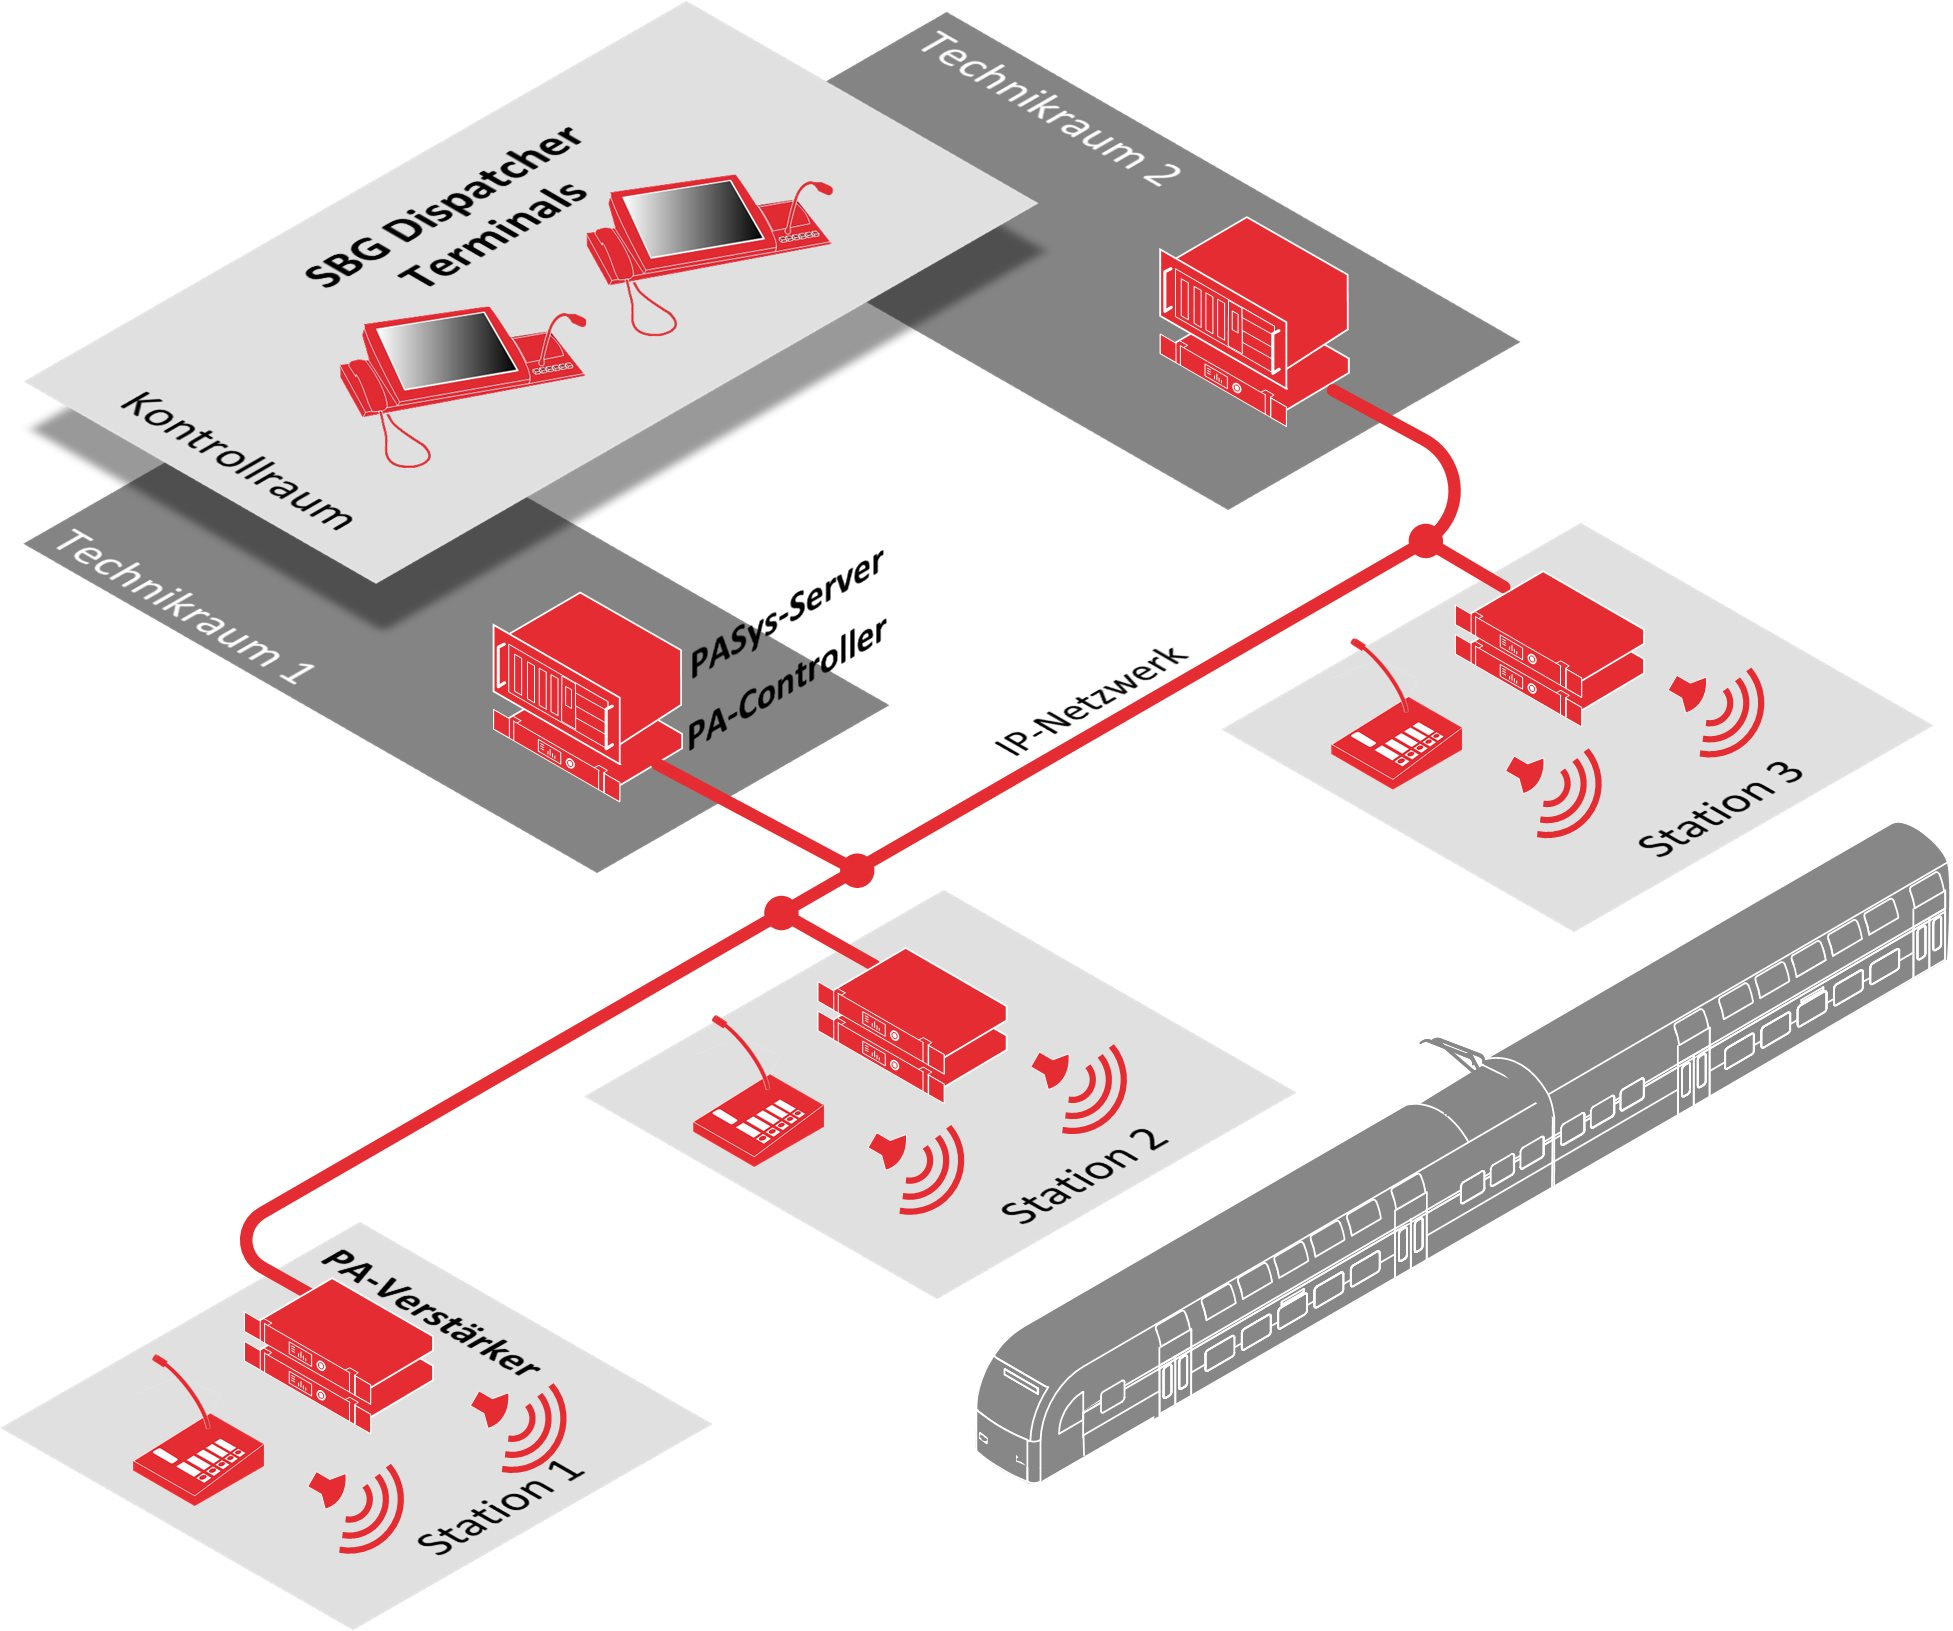 PASys Beschallungslösung mit redundanten PA-Controllern (EN50849 konform)